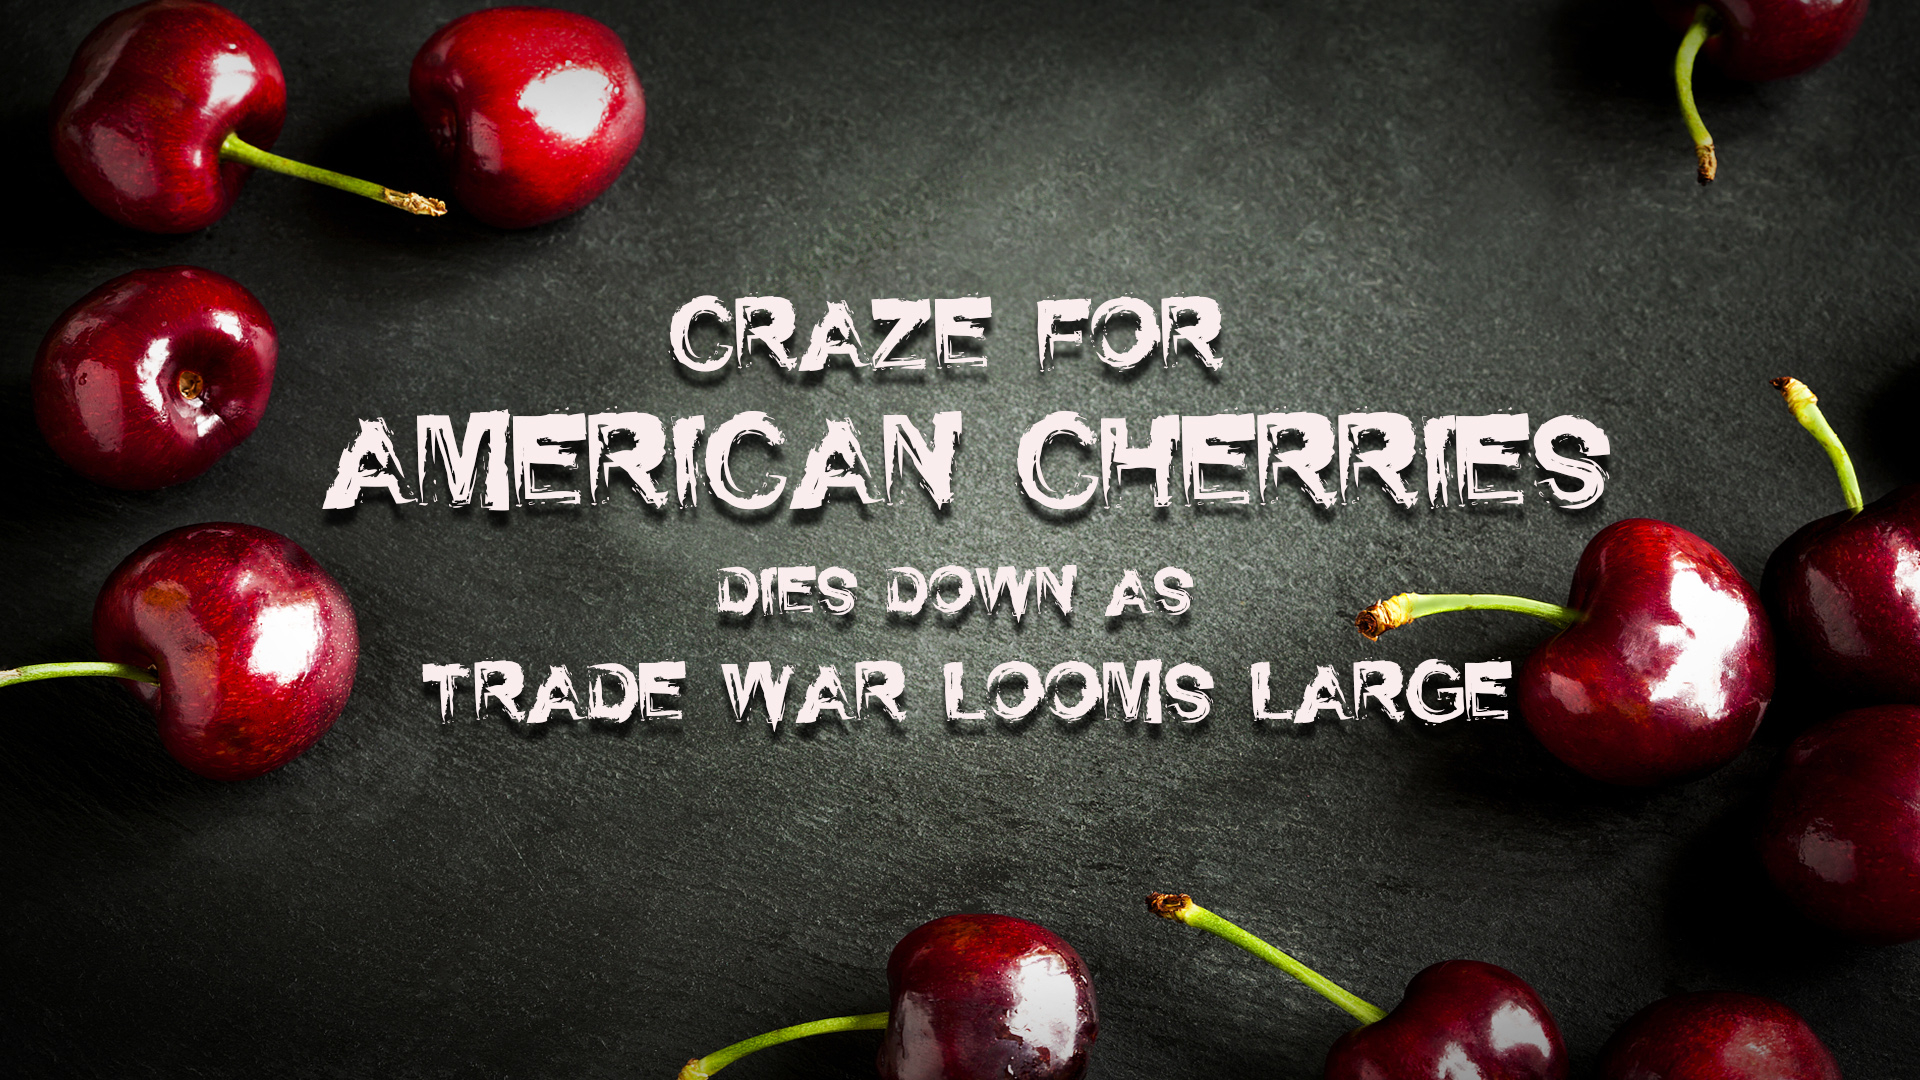 Craze for US cherries dies down as trade war looms large